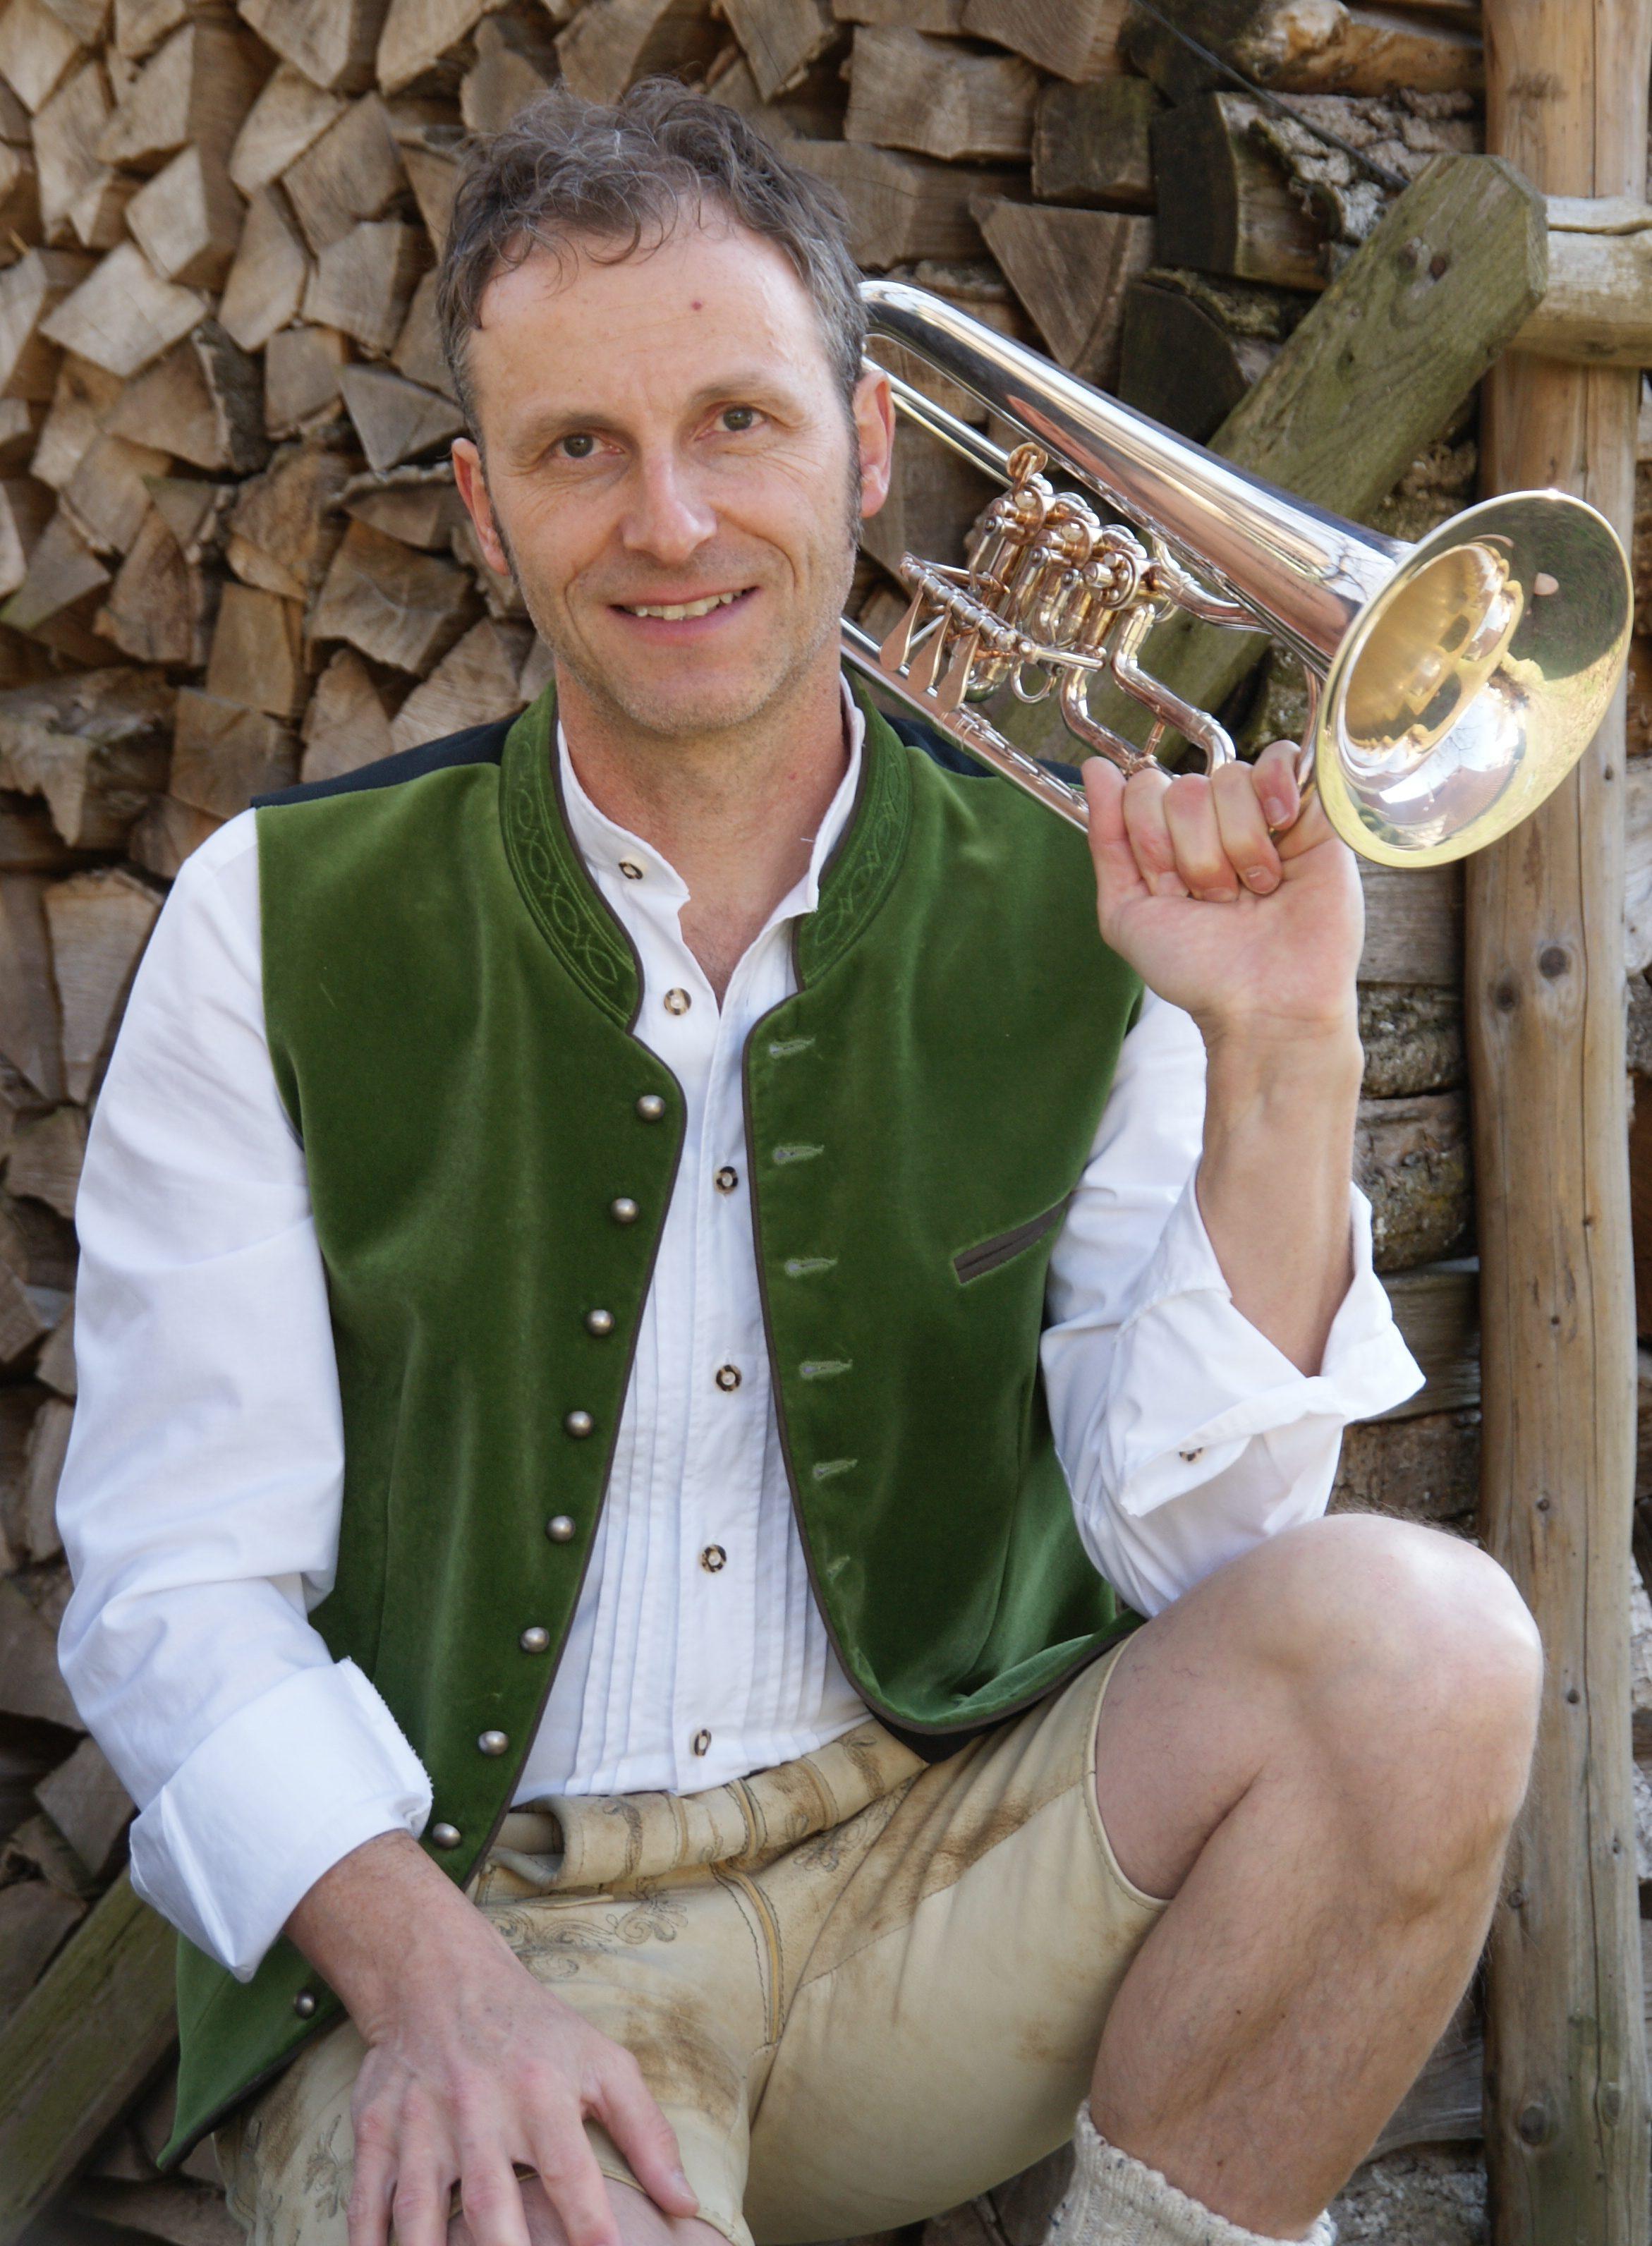 Markus Schmidberger